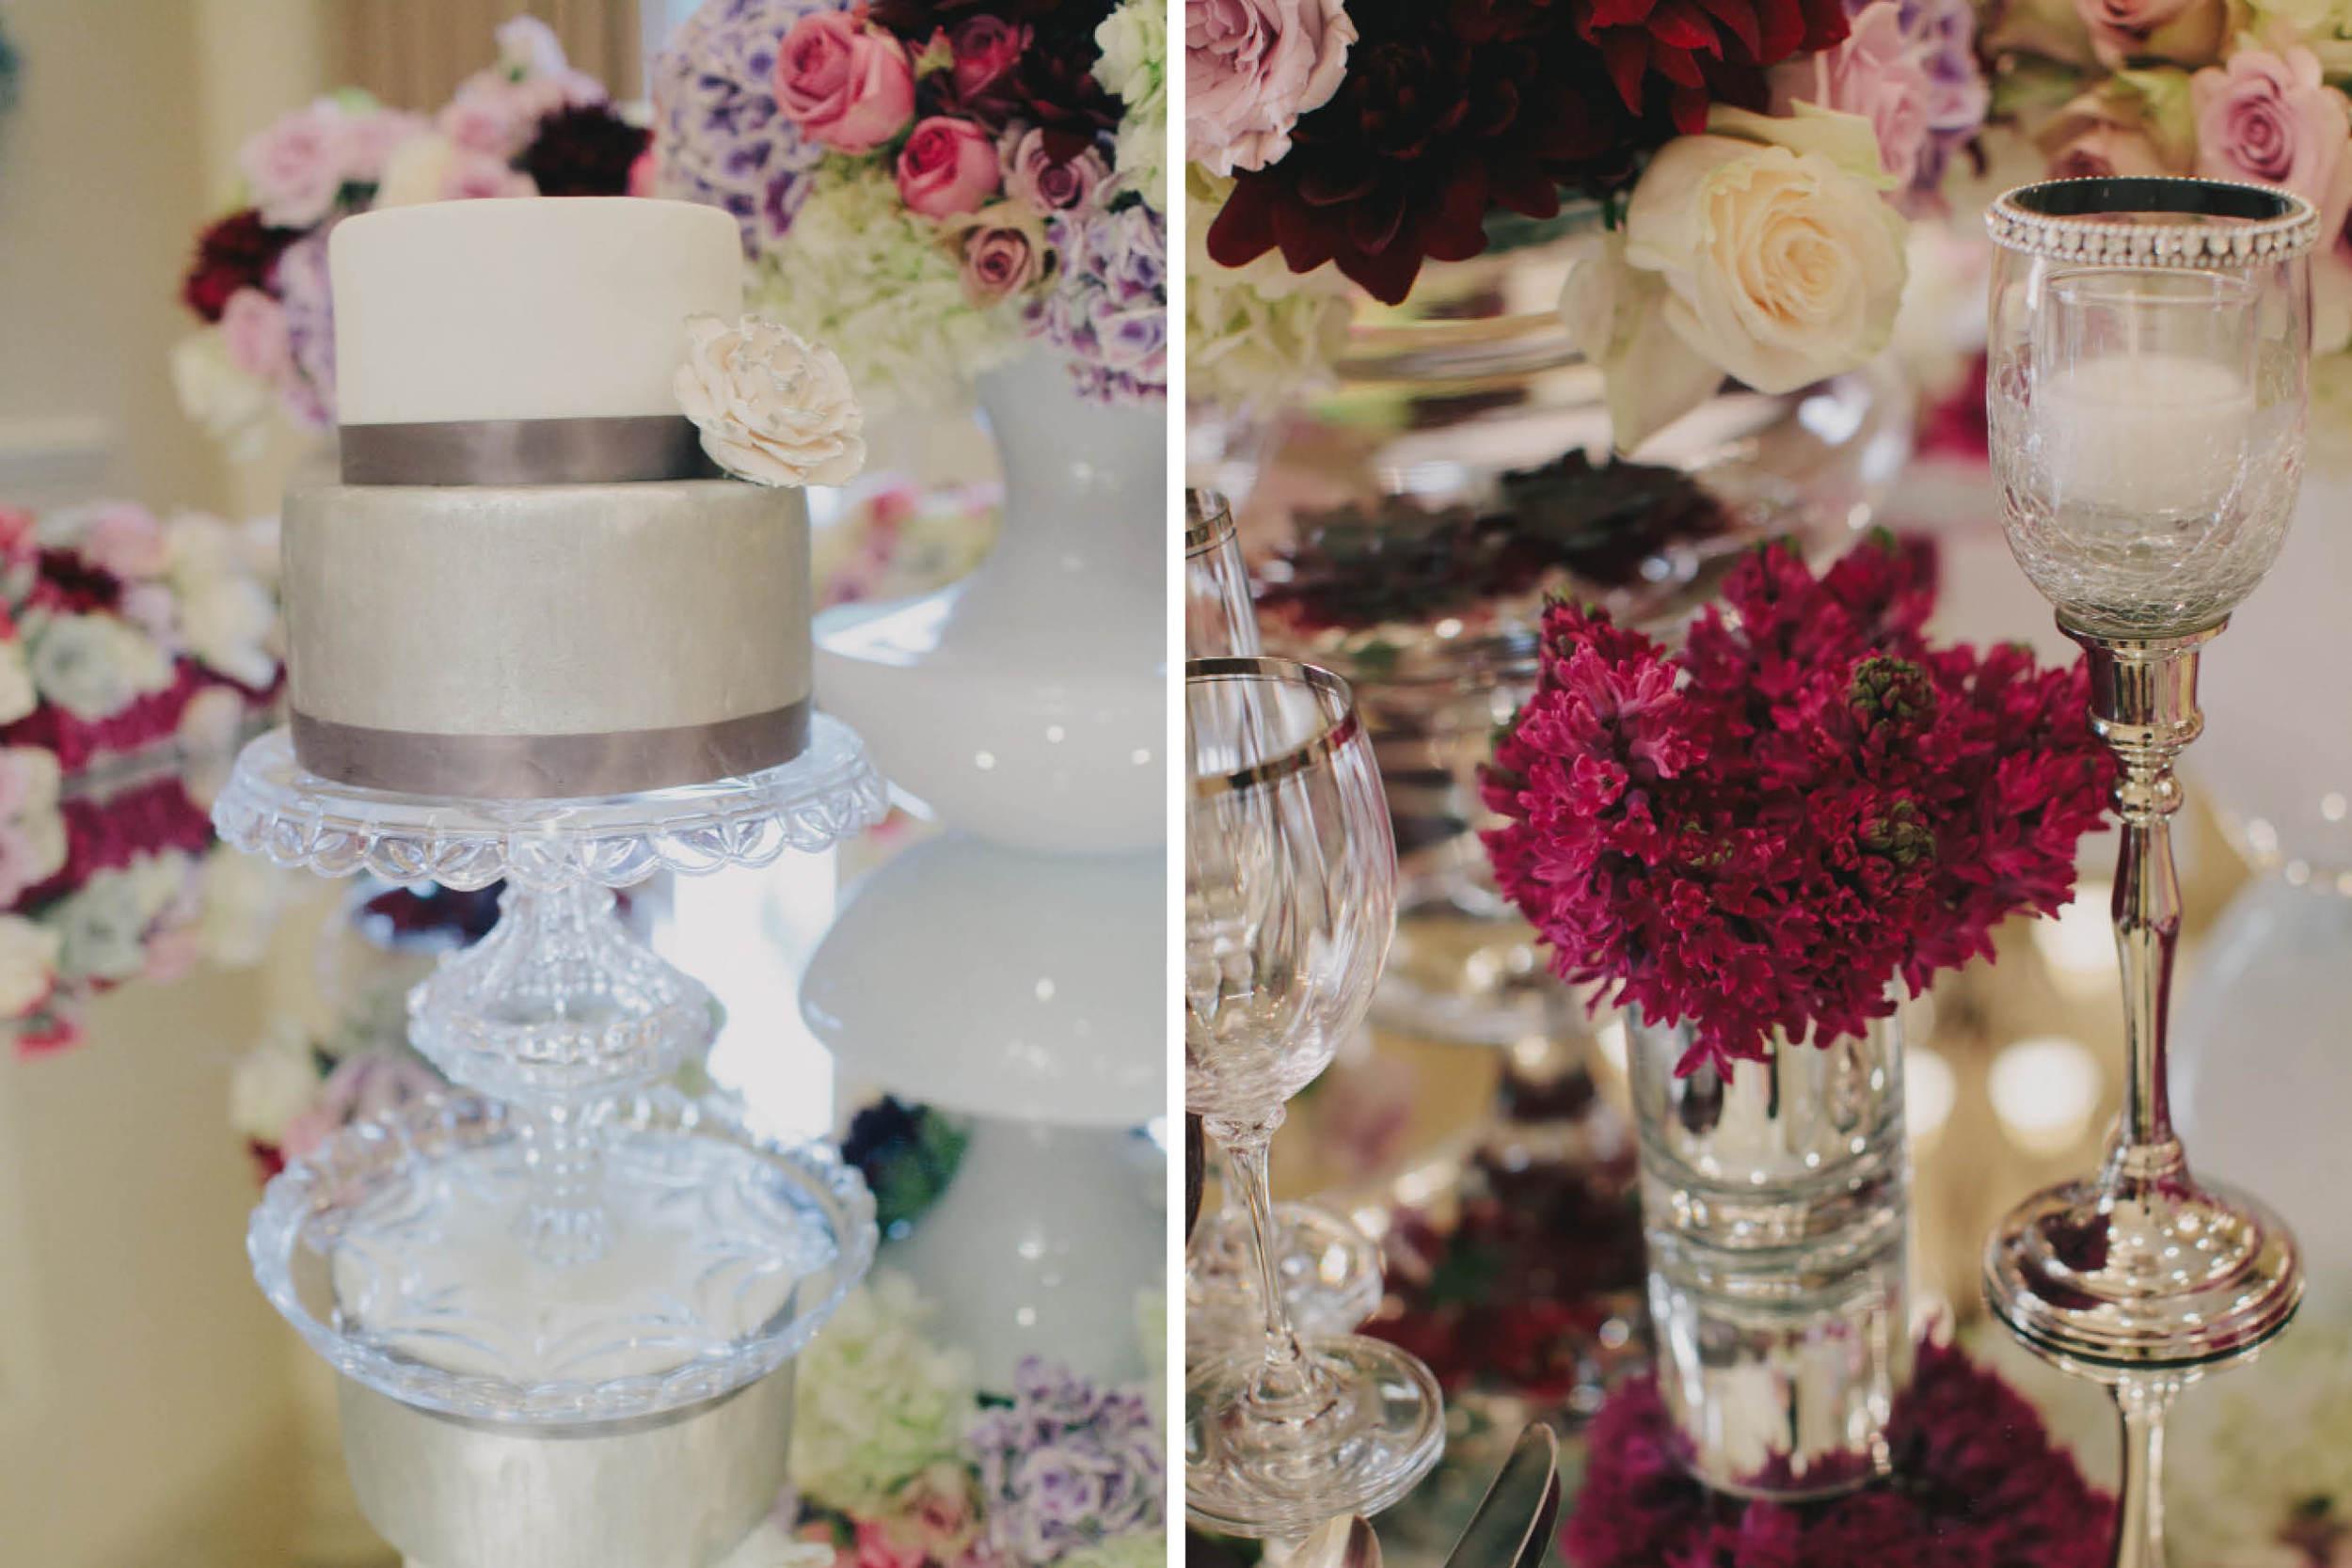 alegria-by-design-wedding-planner-coordinator-santa-barbara-montecito-inn-penthouse (22).jpg